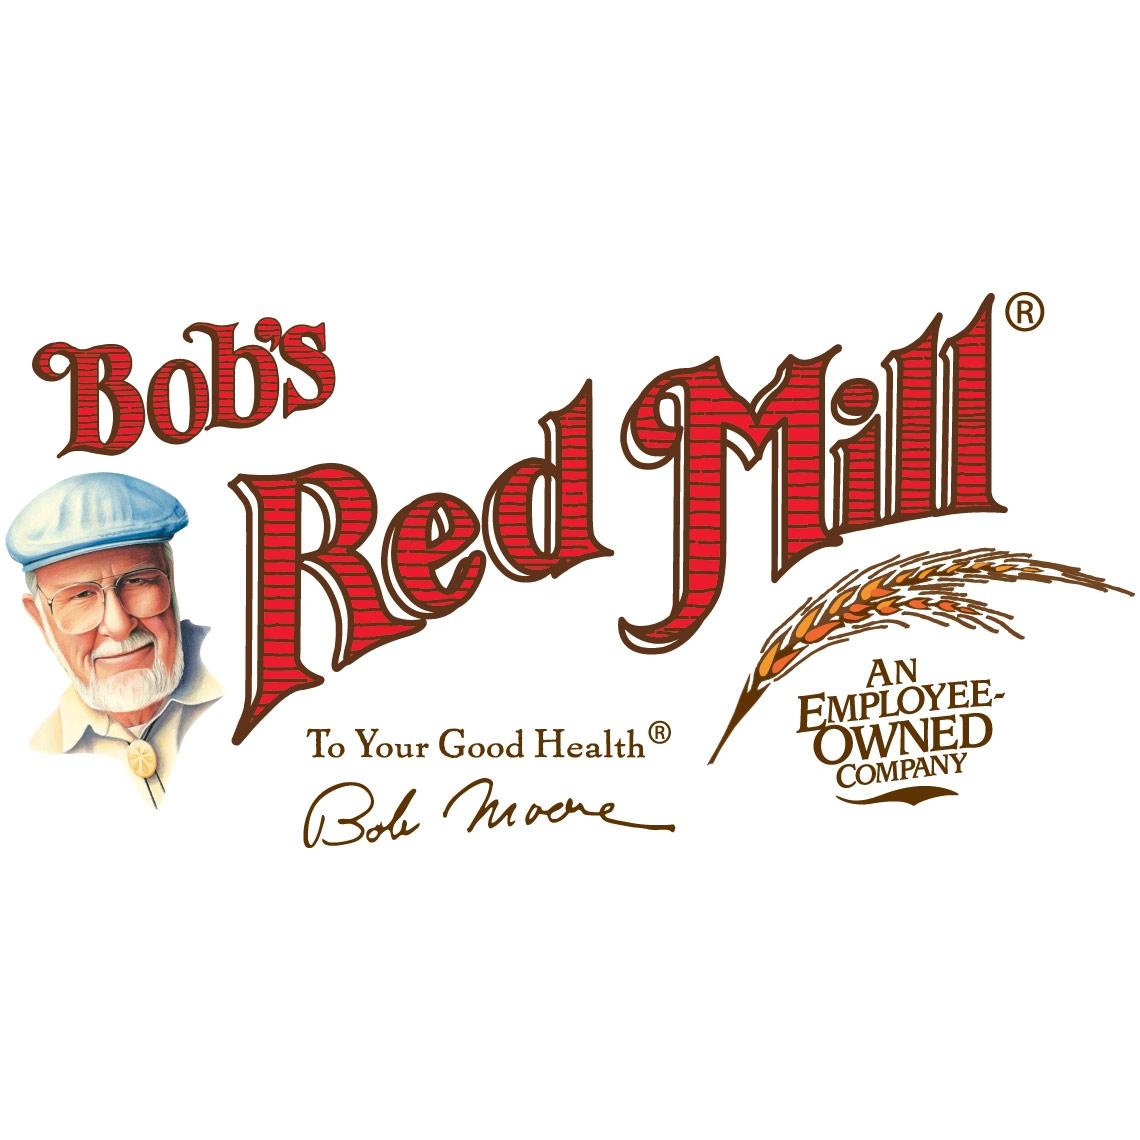 Barley Flour - Learn Health Benefits